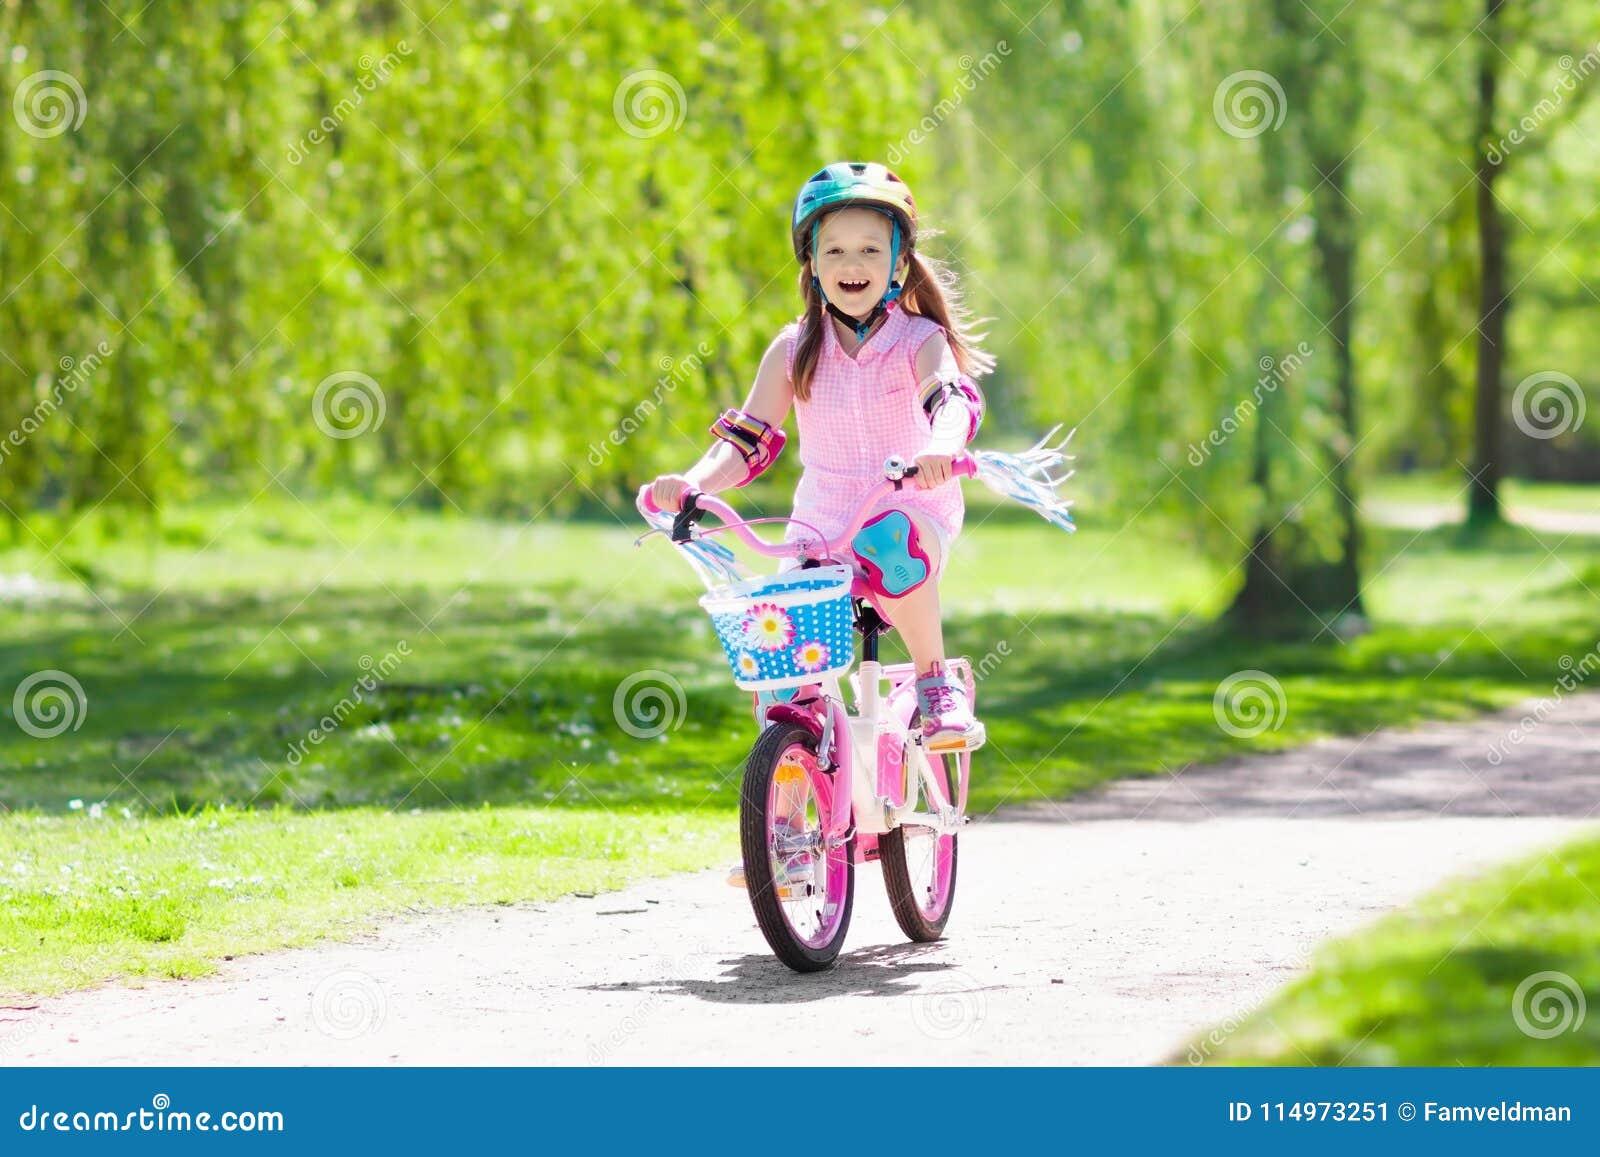 Child On Bike  Kids Ride Bicycle  Girl Cycling  Stock Image